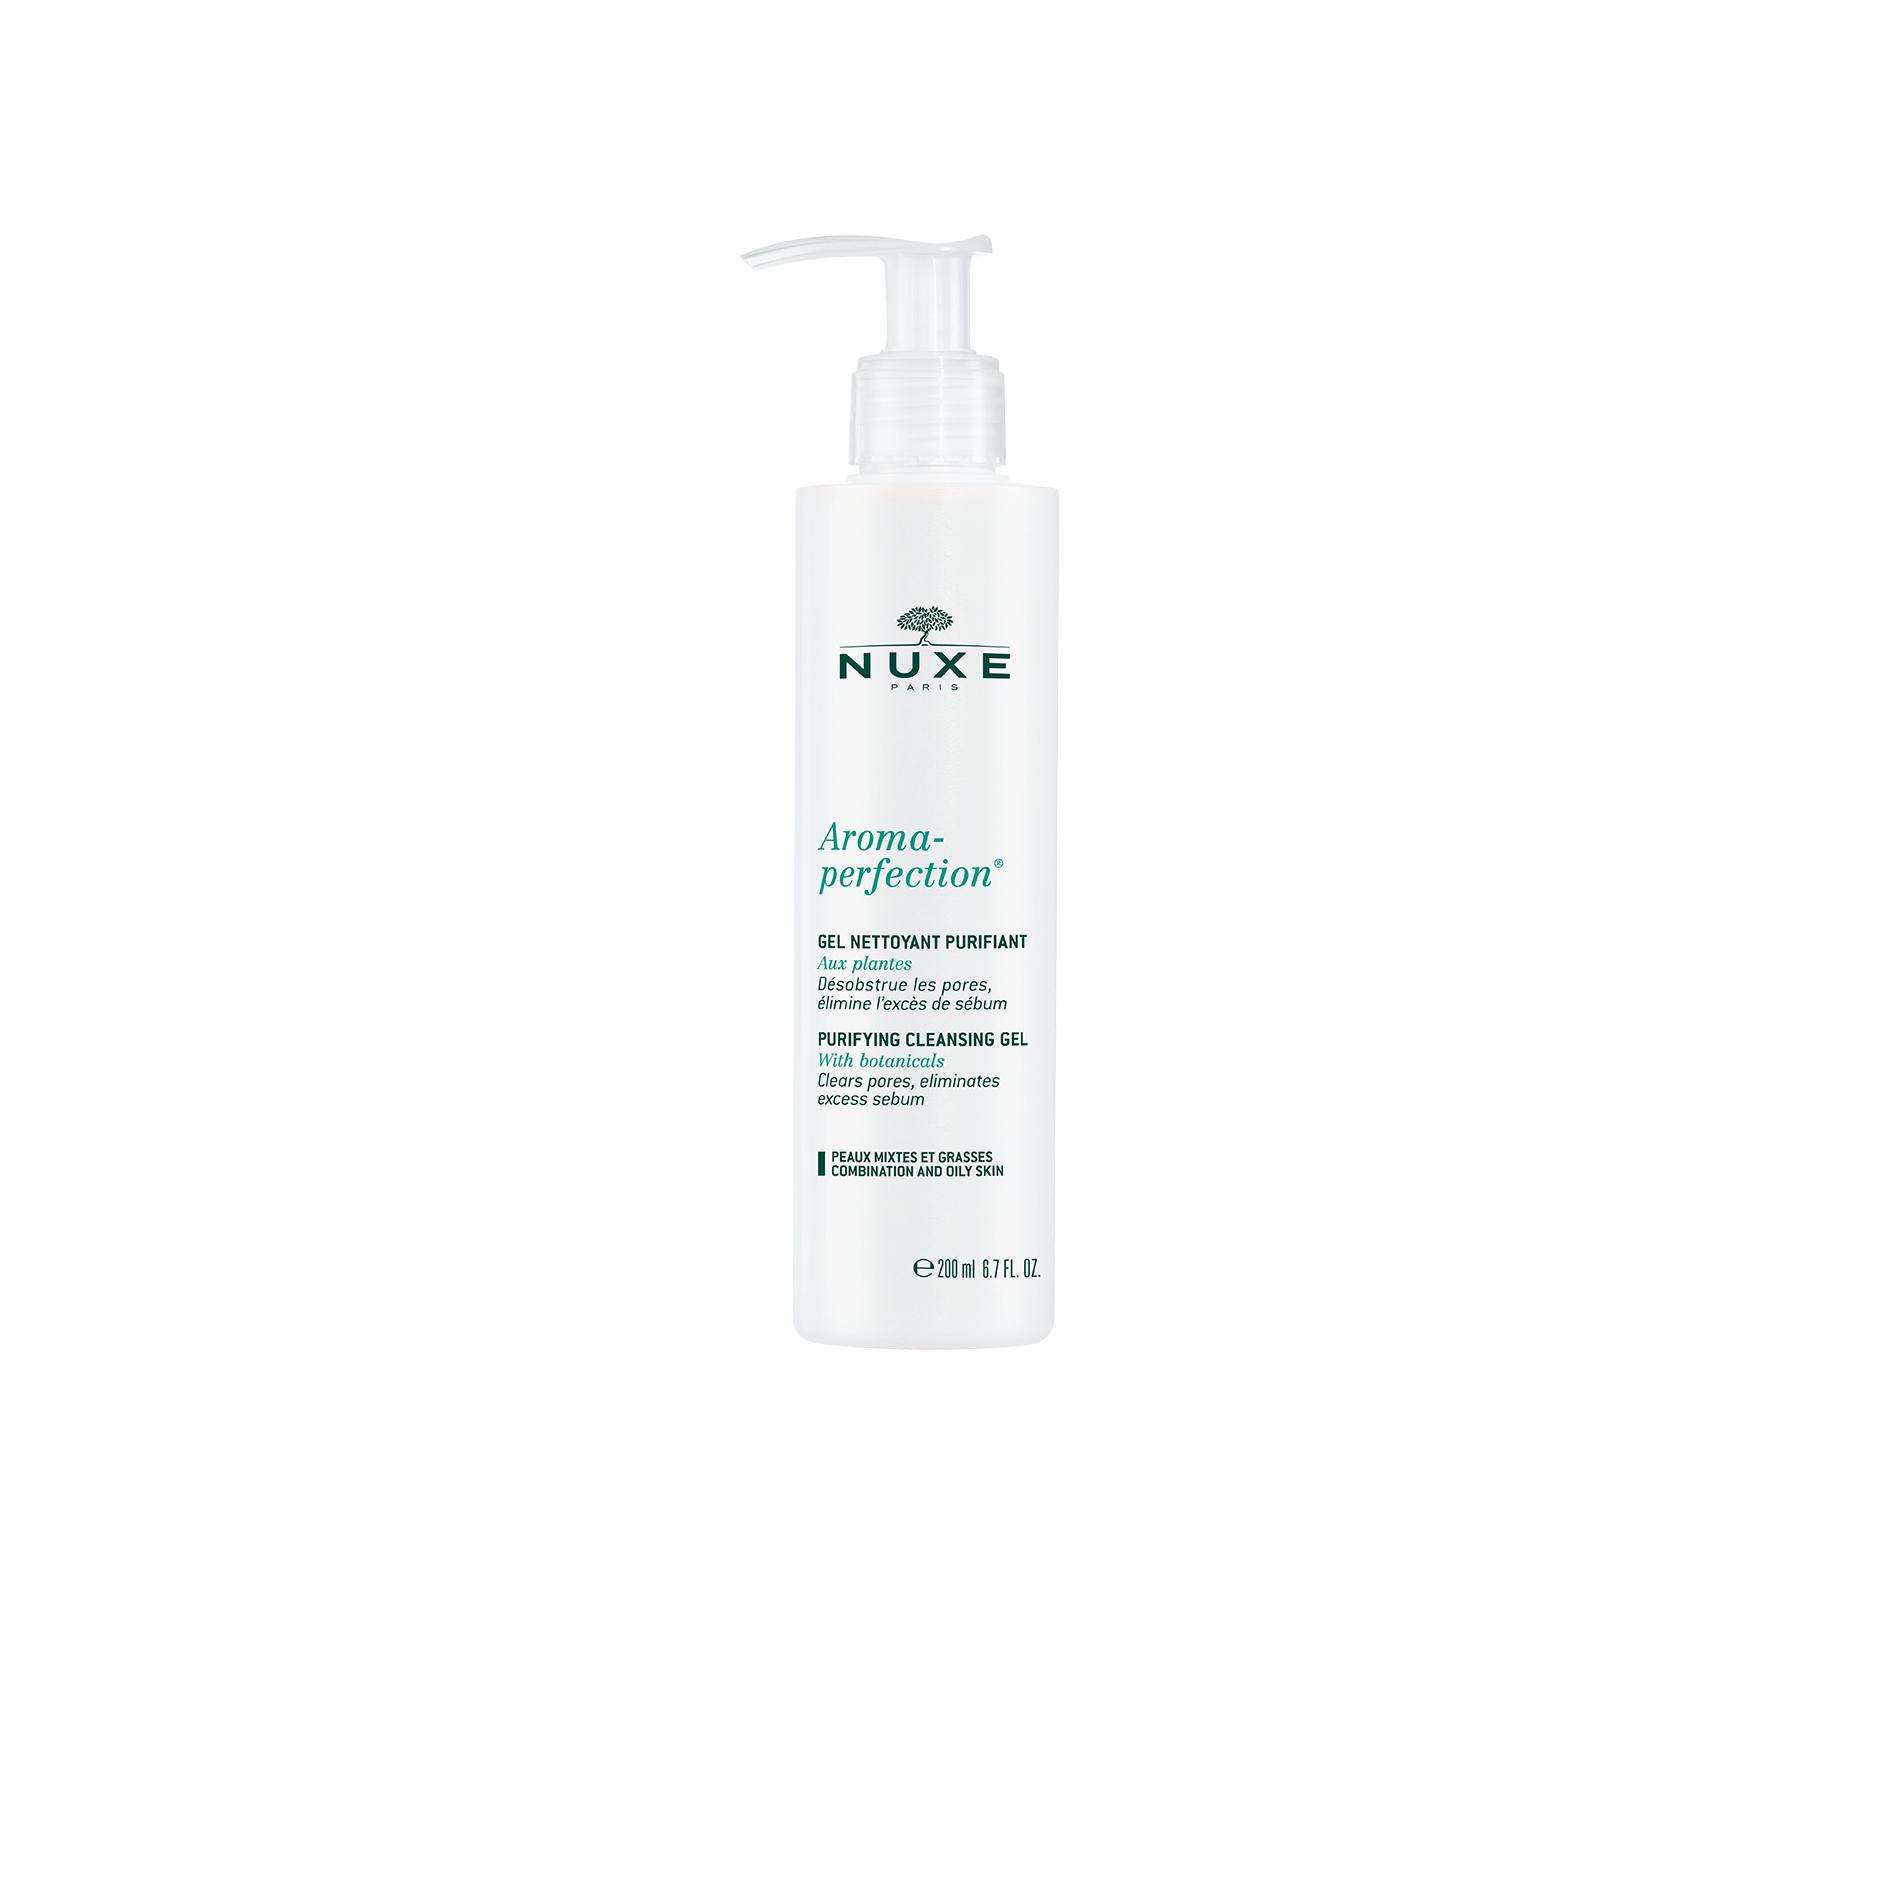 Nuxe Aroma Perfection Gel – Gel Καθαρισμού Προσώπου για Μεικτό και Λιπαρό Δέρμα 200ml